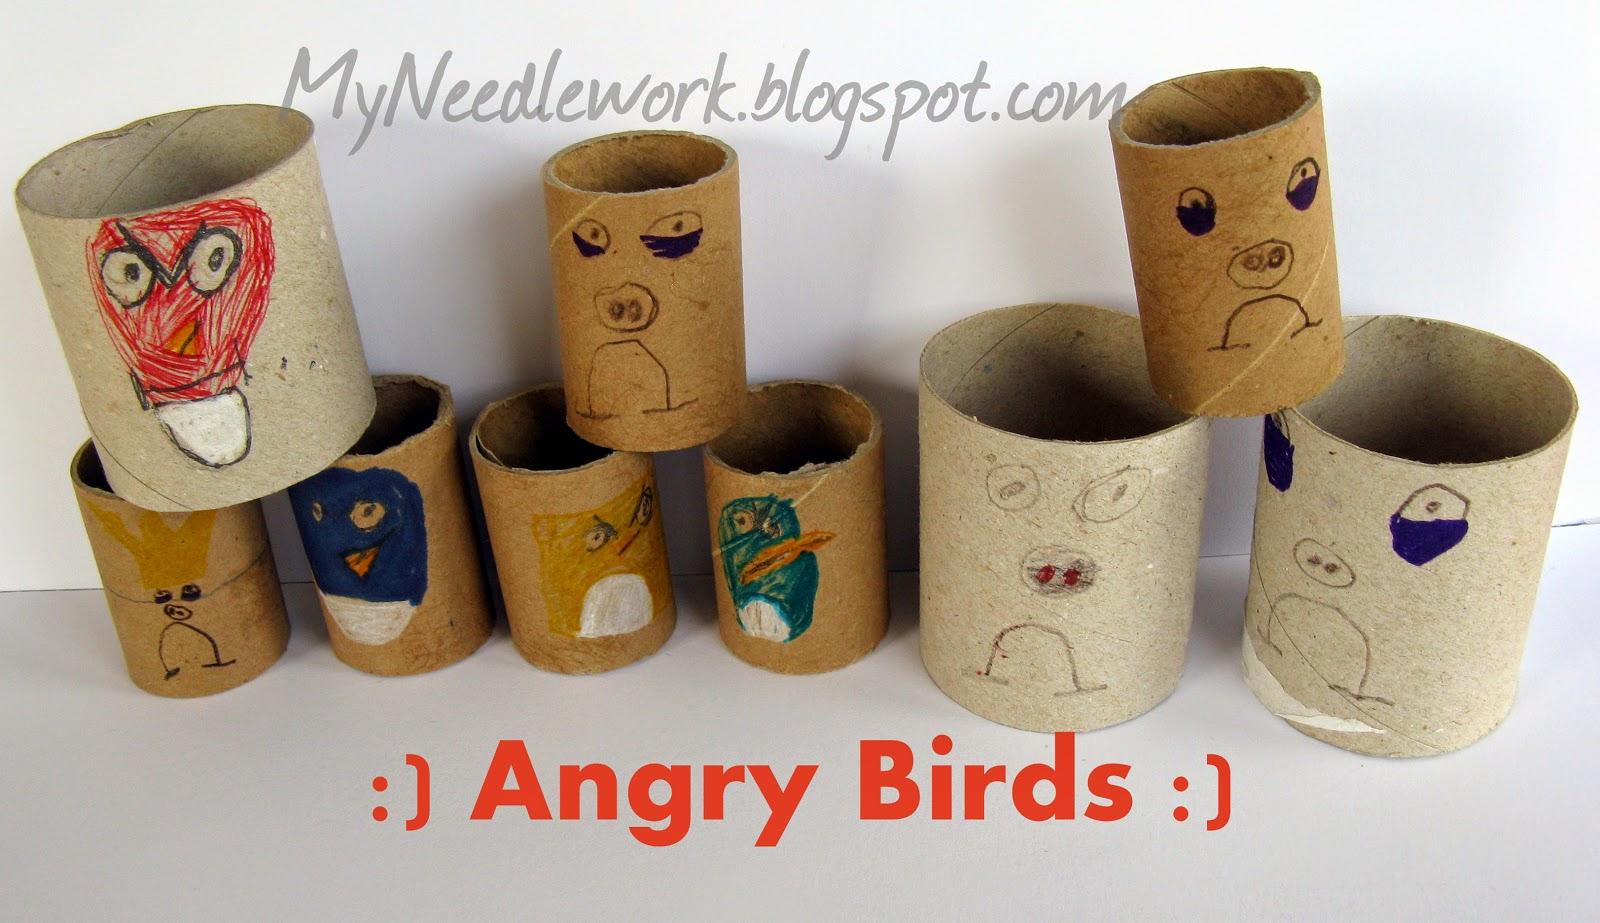 Птички Angry Birds (енри бердс)